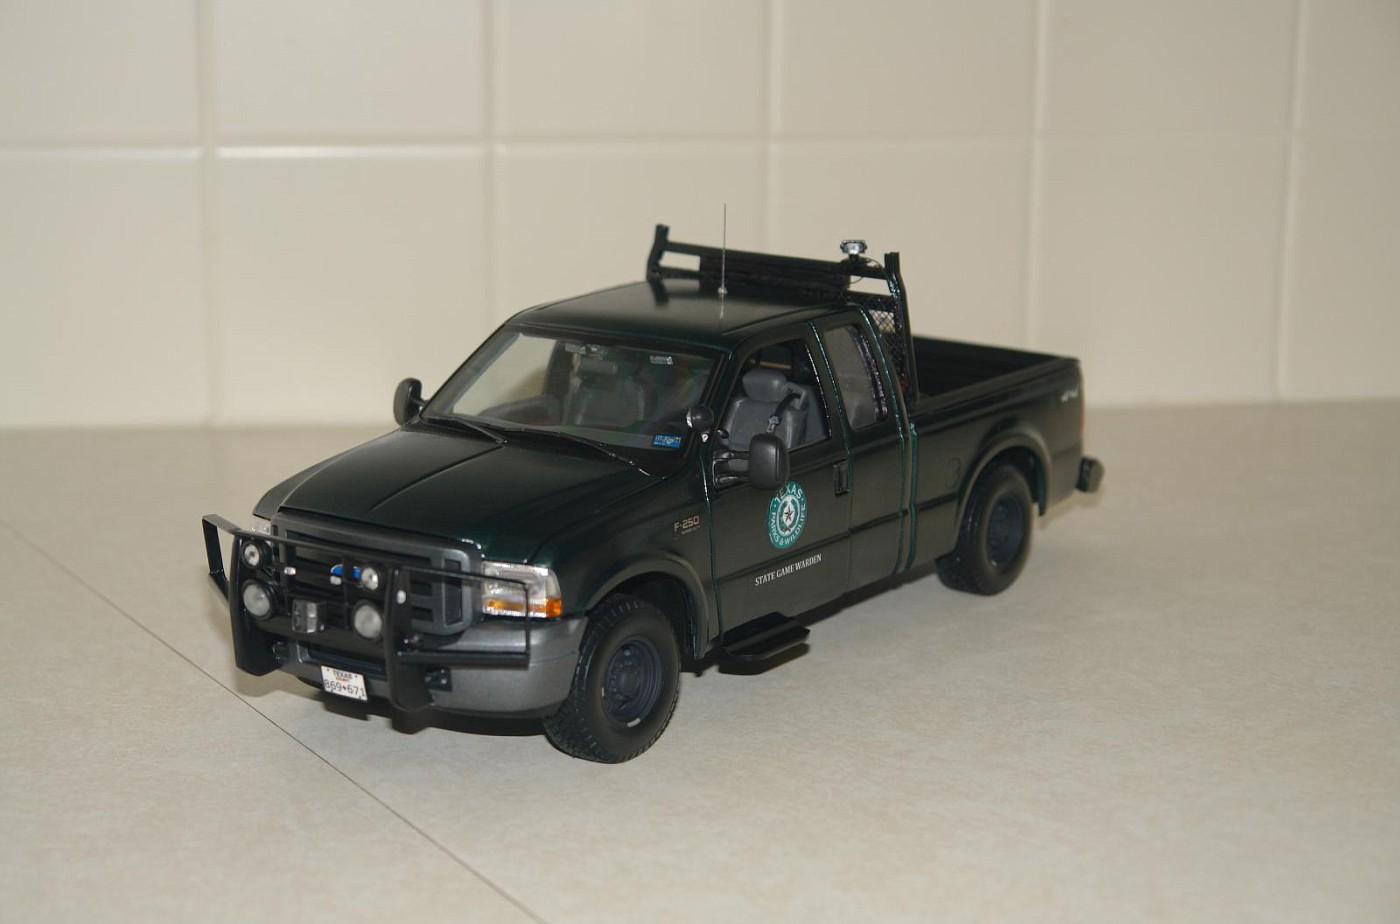 Photo Dsc00127 Texas Game Warden Truck Ford F 250 Album